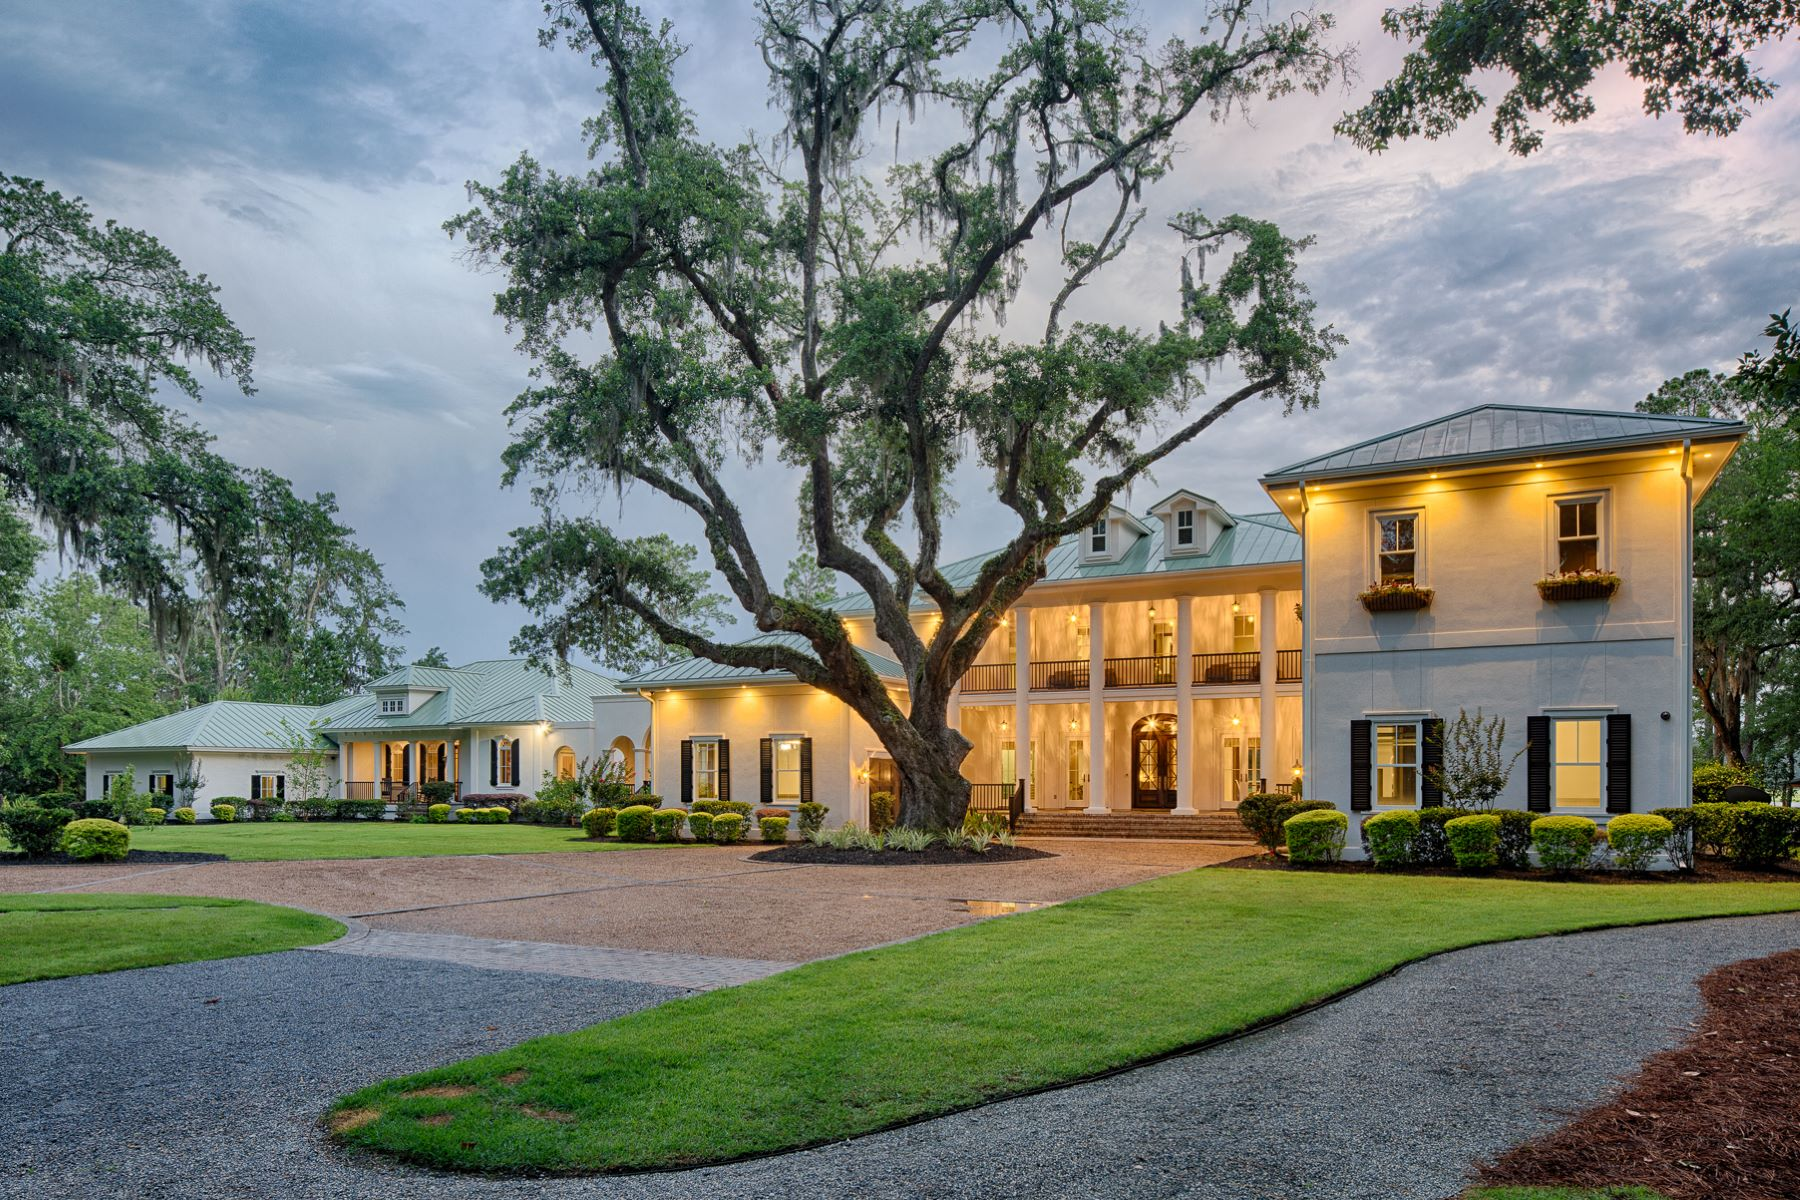 Single Family Homes για την Πώληση στο 135 Gascoigne Bluff Road, Bluffton, Νότια Καρολίνα 29910 Ηνωμένες Πολιτείες